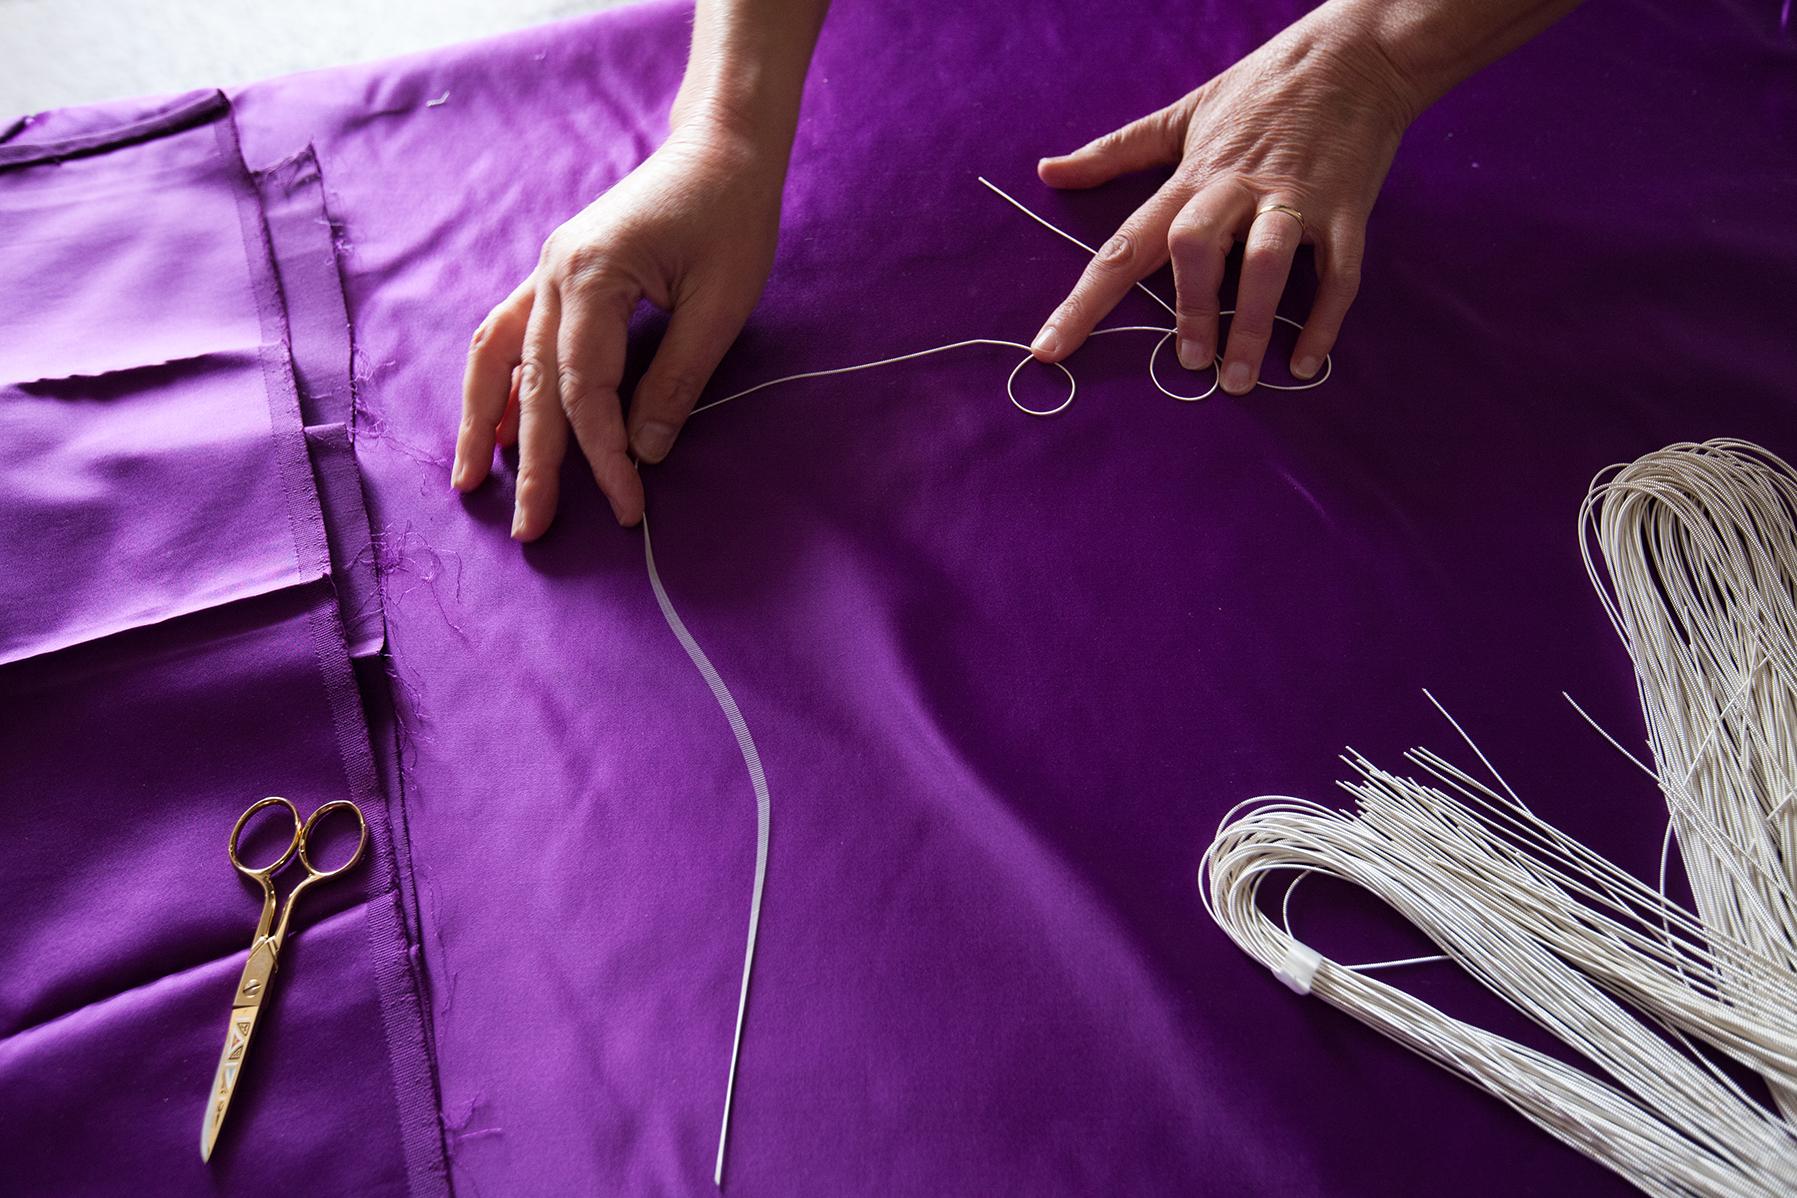 Canutiglia argento su seta viola